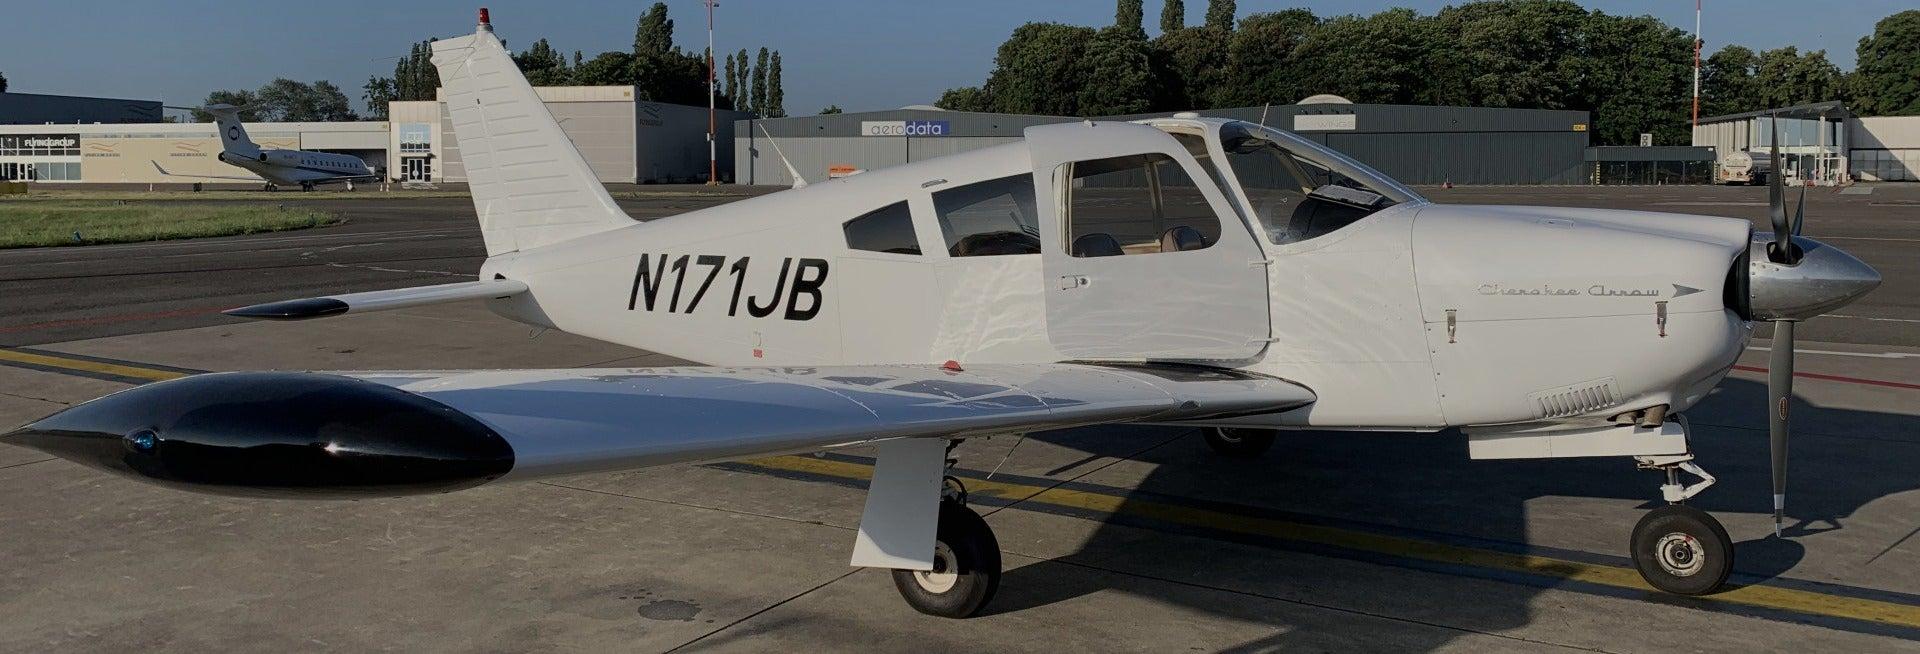 Paseo en avioneta por Besanzón